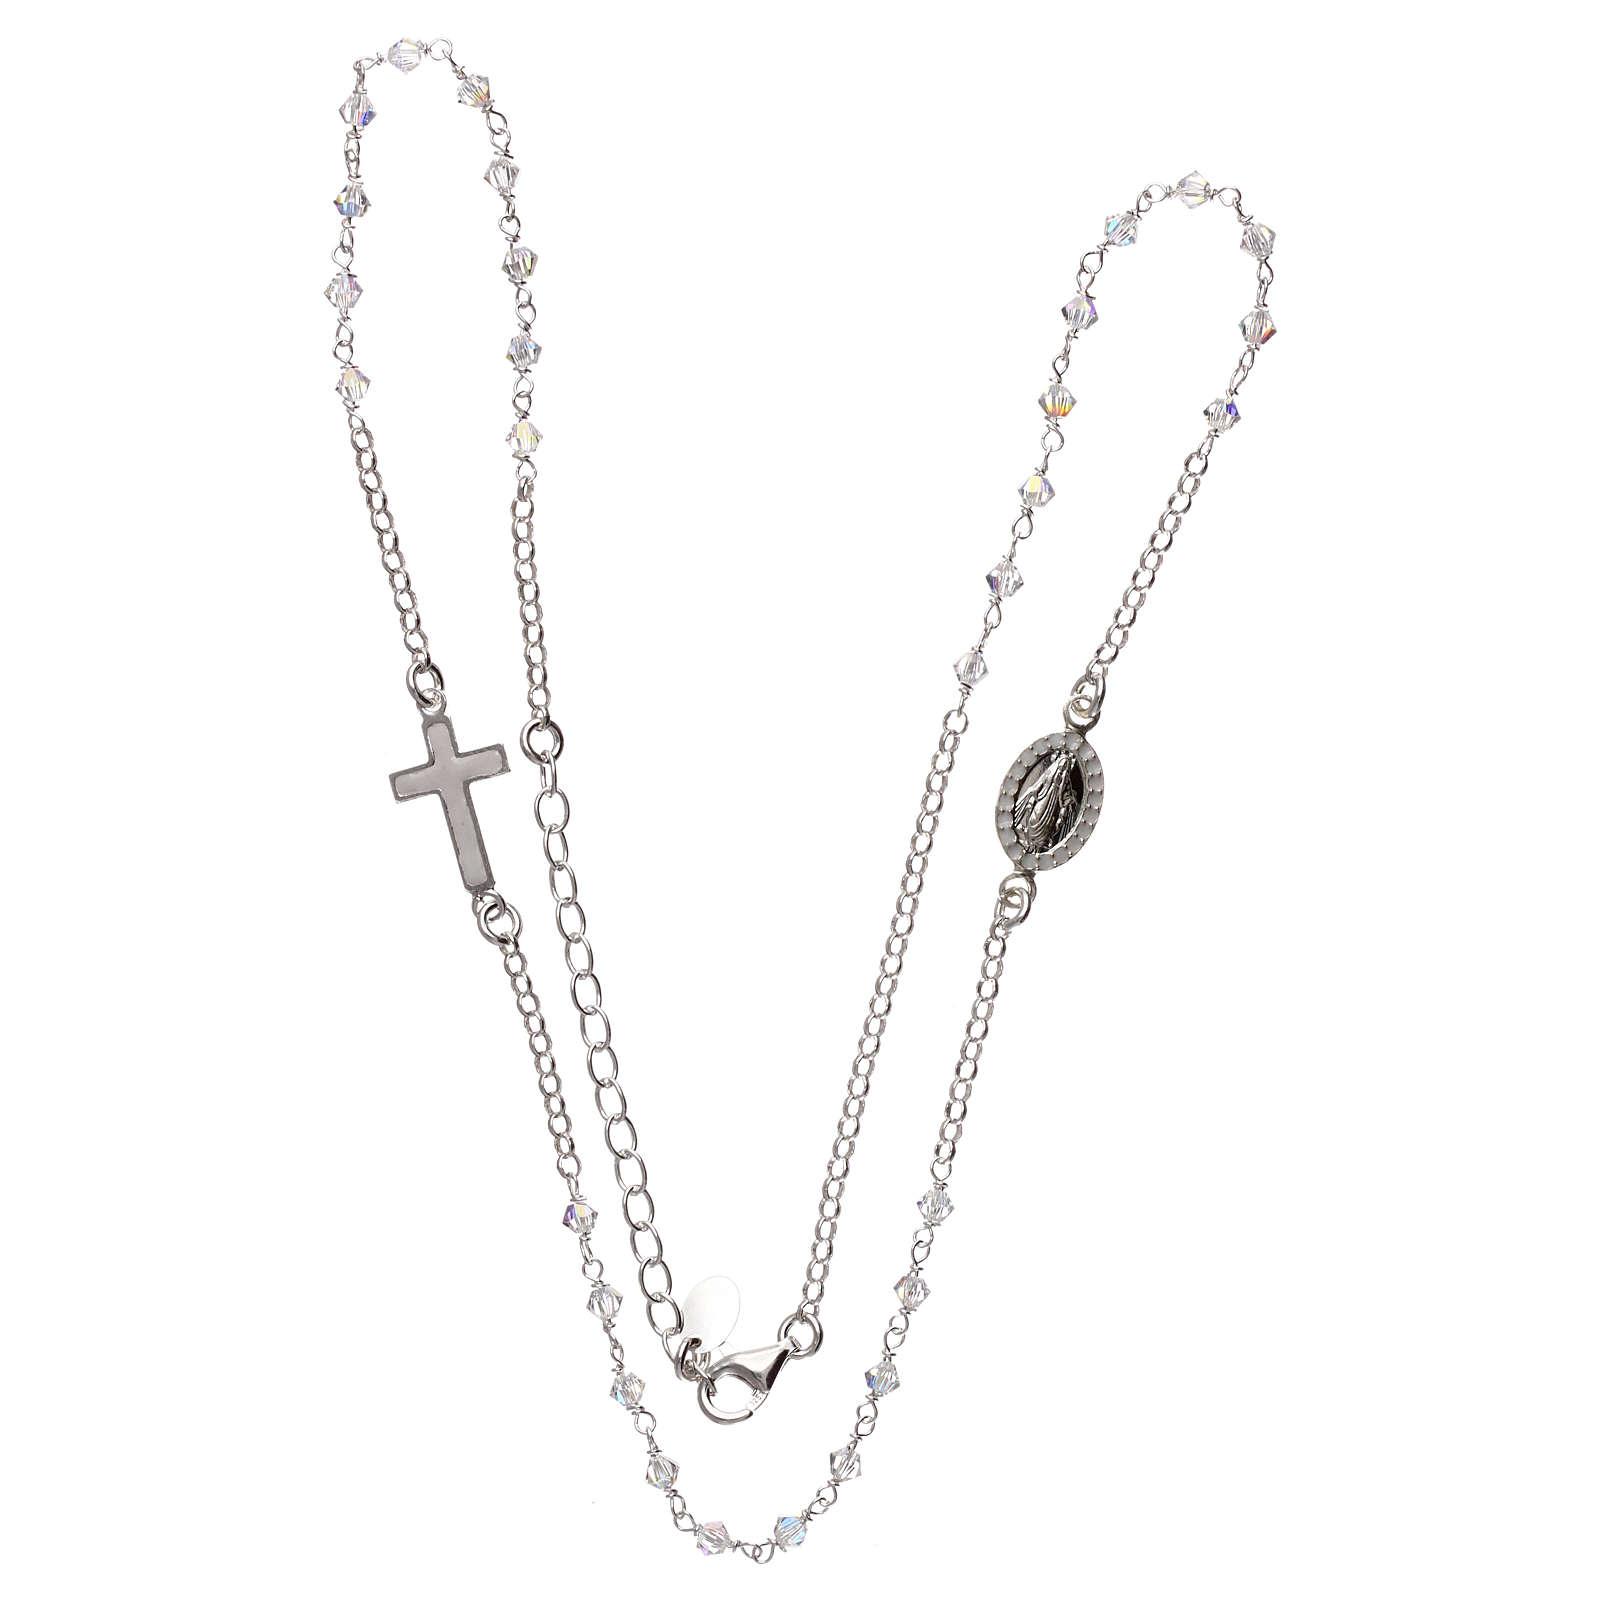 Collar rosario plata 925 con Swarovski transparentes 4